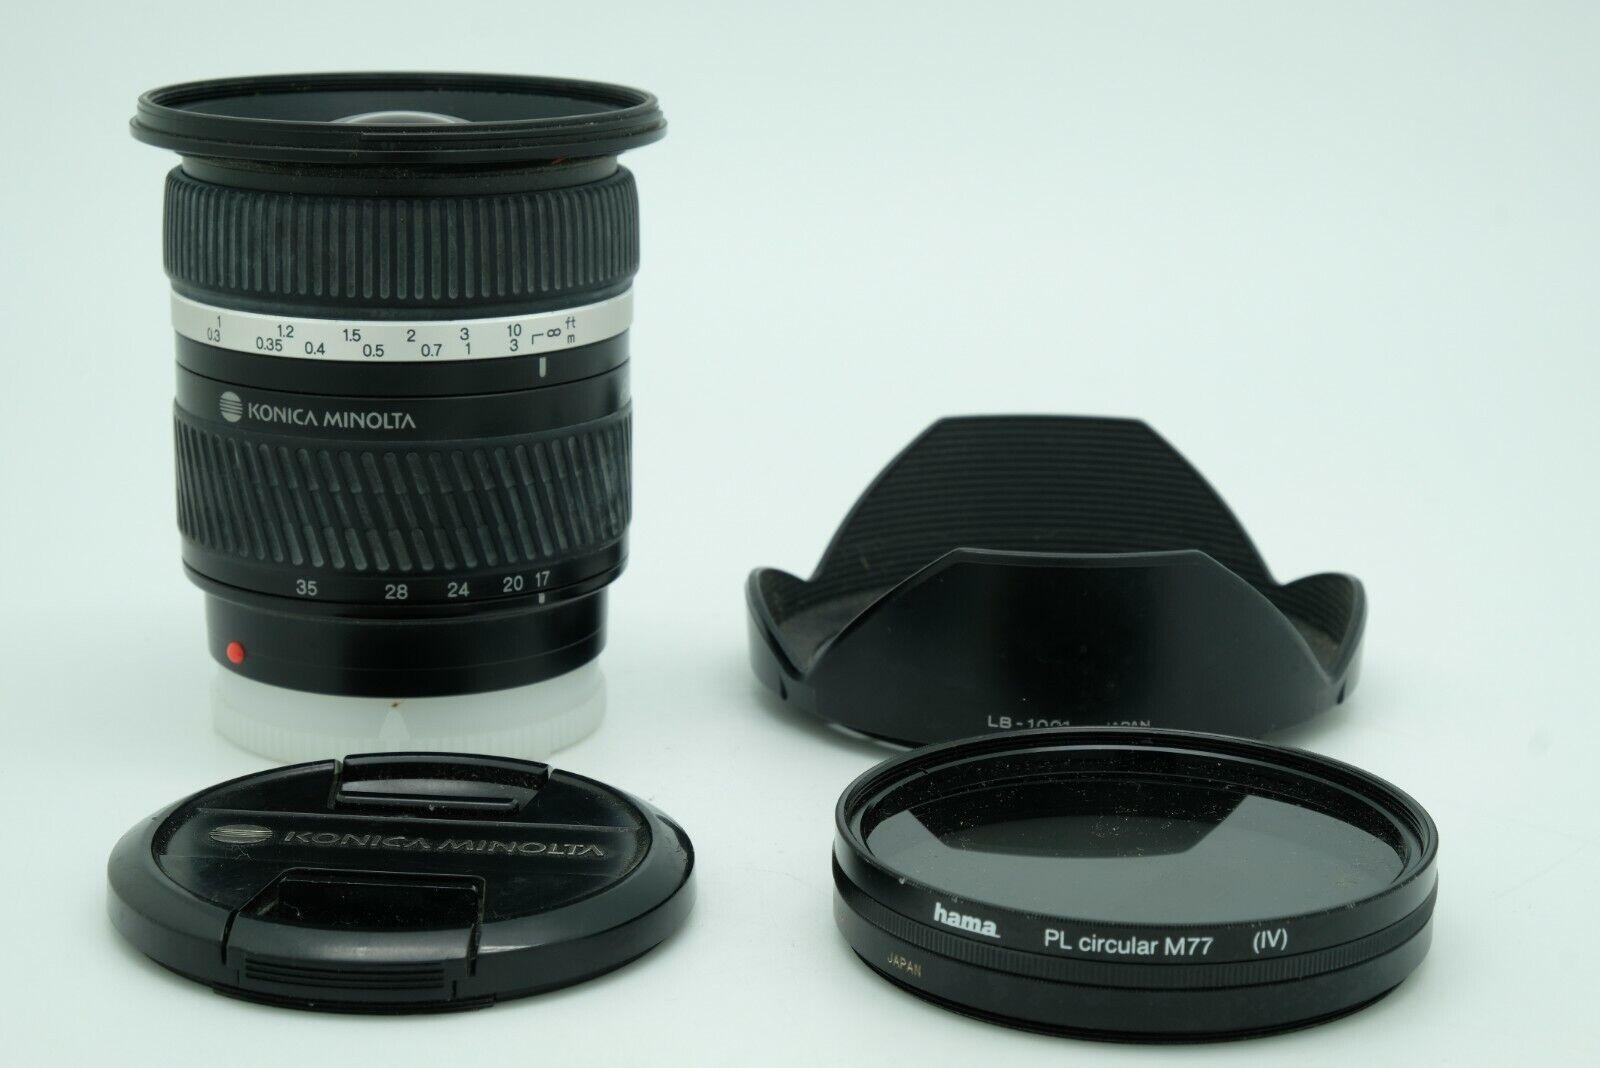 Konica Minolta AF Zoom 17-35 mm f/2,8-4,0 D for Reflex Sony A-mount Alpha Filter